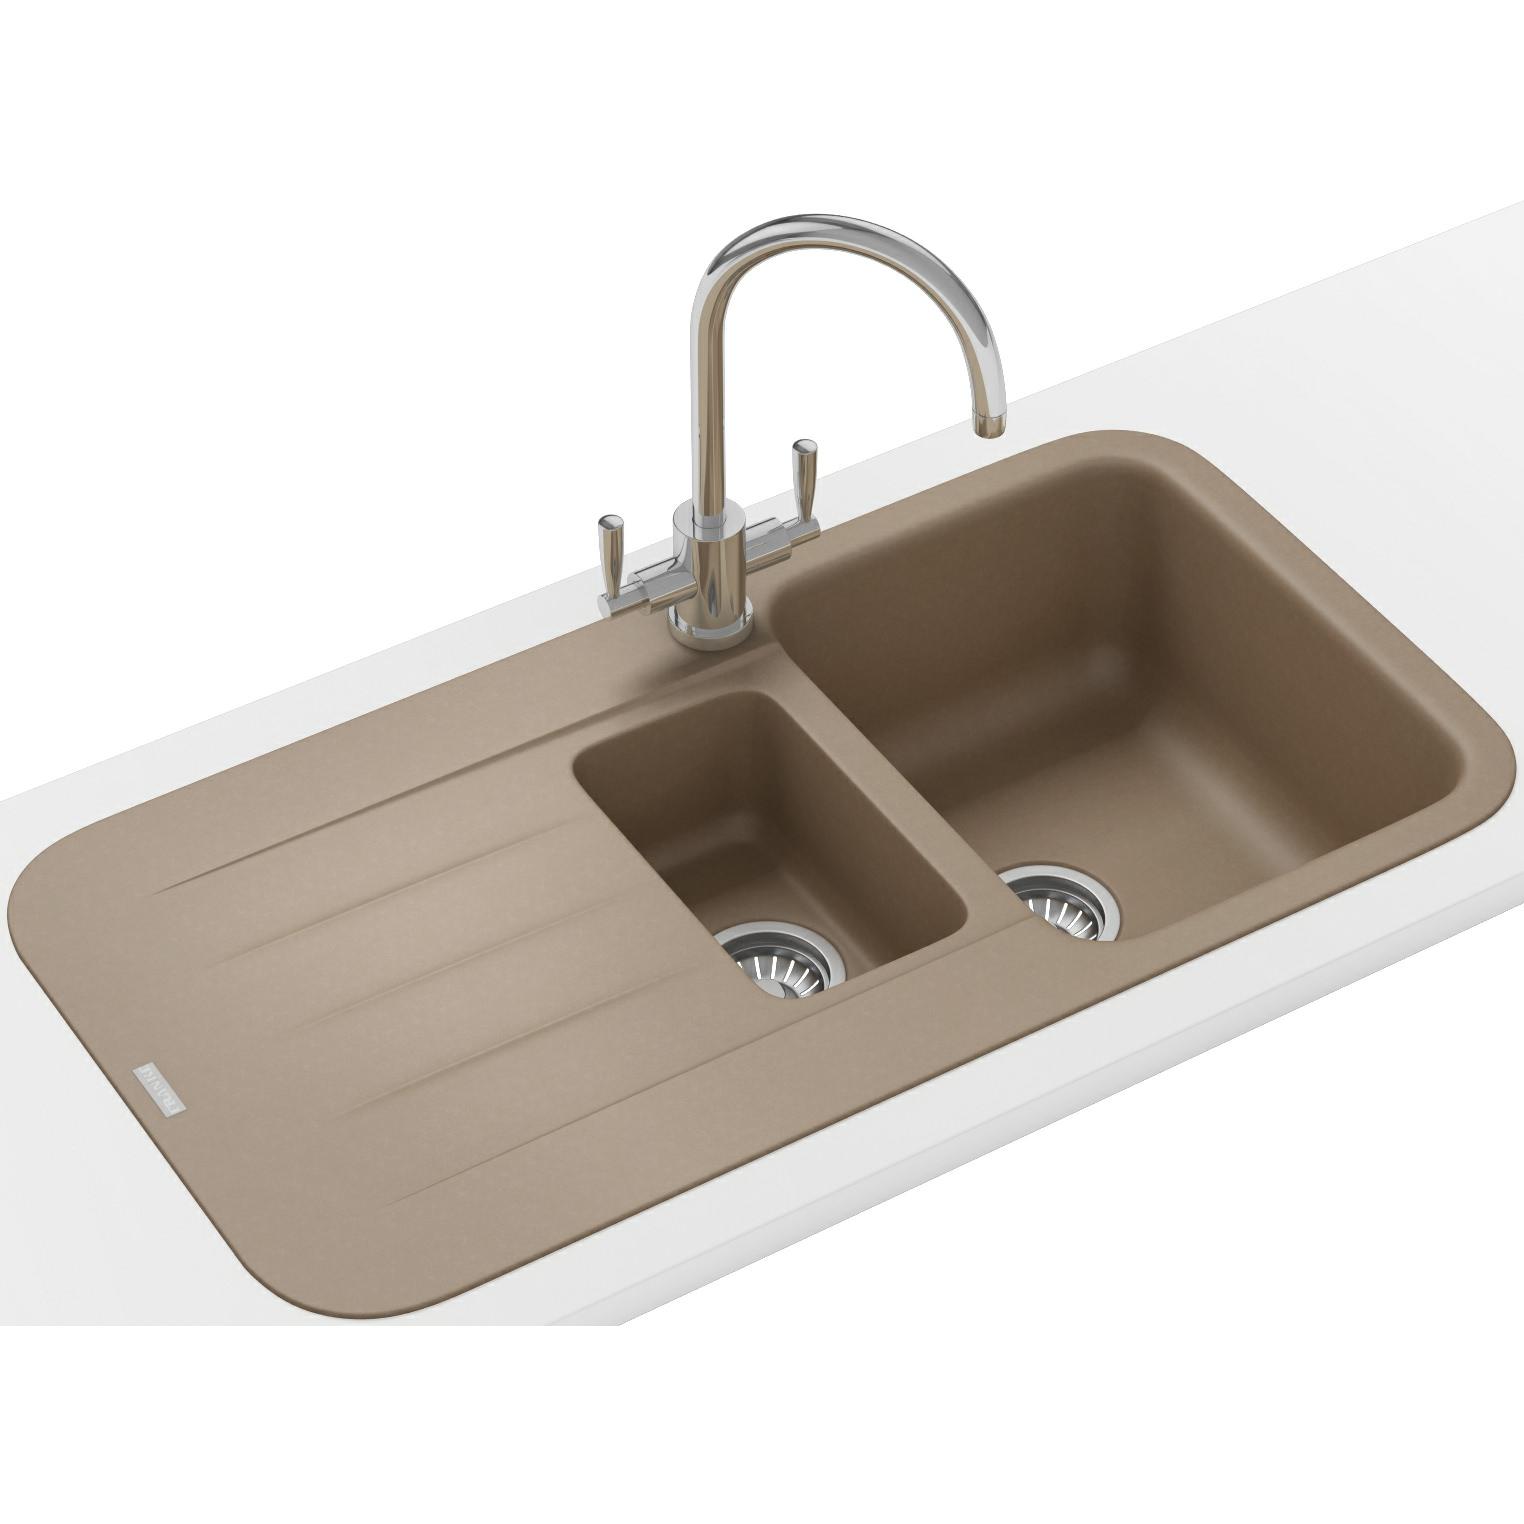 Fitting Franke Sink : Franke Pebel PBG 651 Fragranite Oyster 1.5 Bowl Inset Sink 114.0312 ...